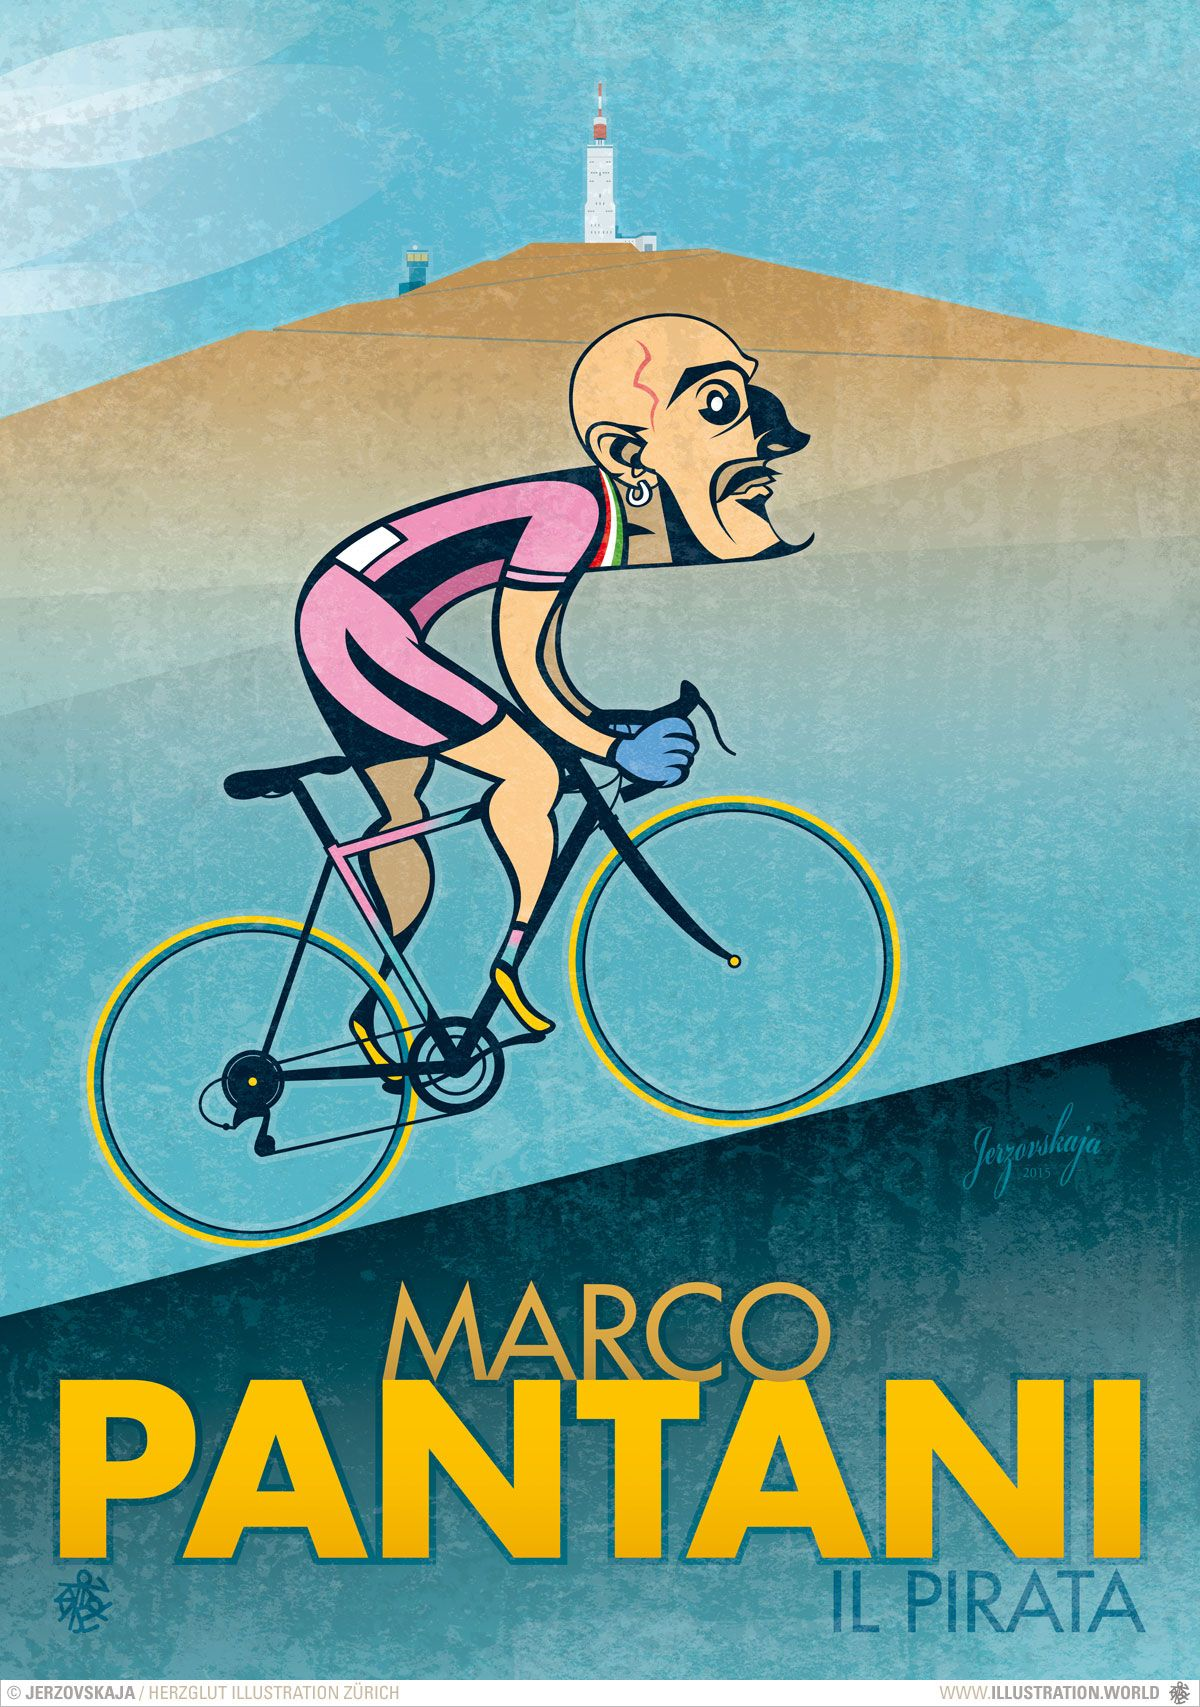 Marco Pantani - Il Pirata. Illustration © 2015 by Jerzovskaja. www ...